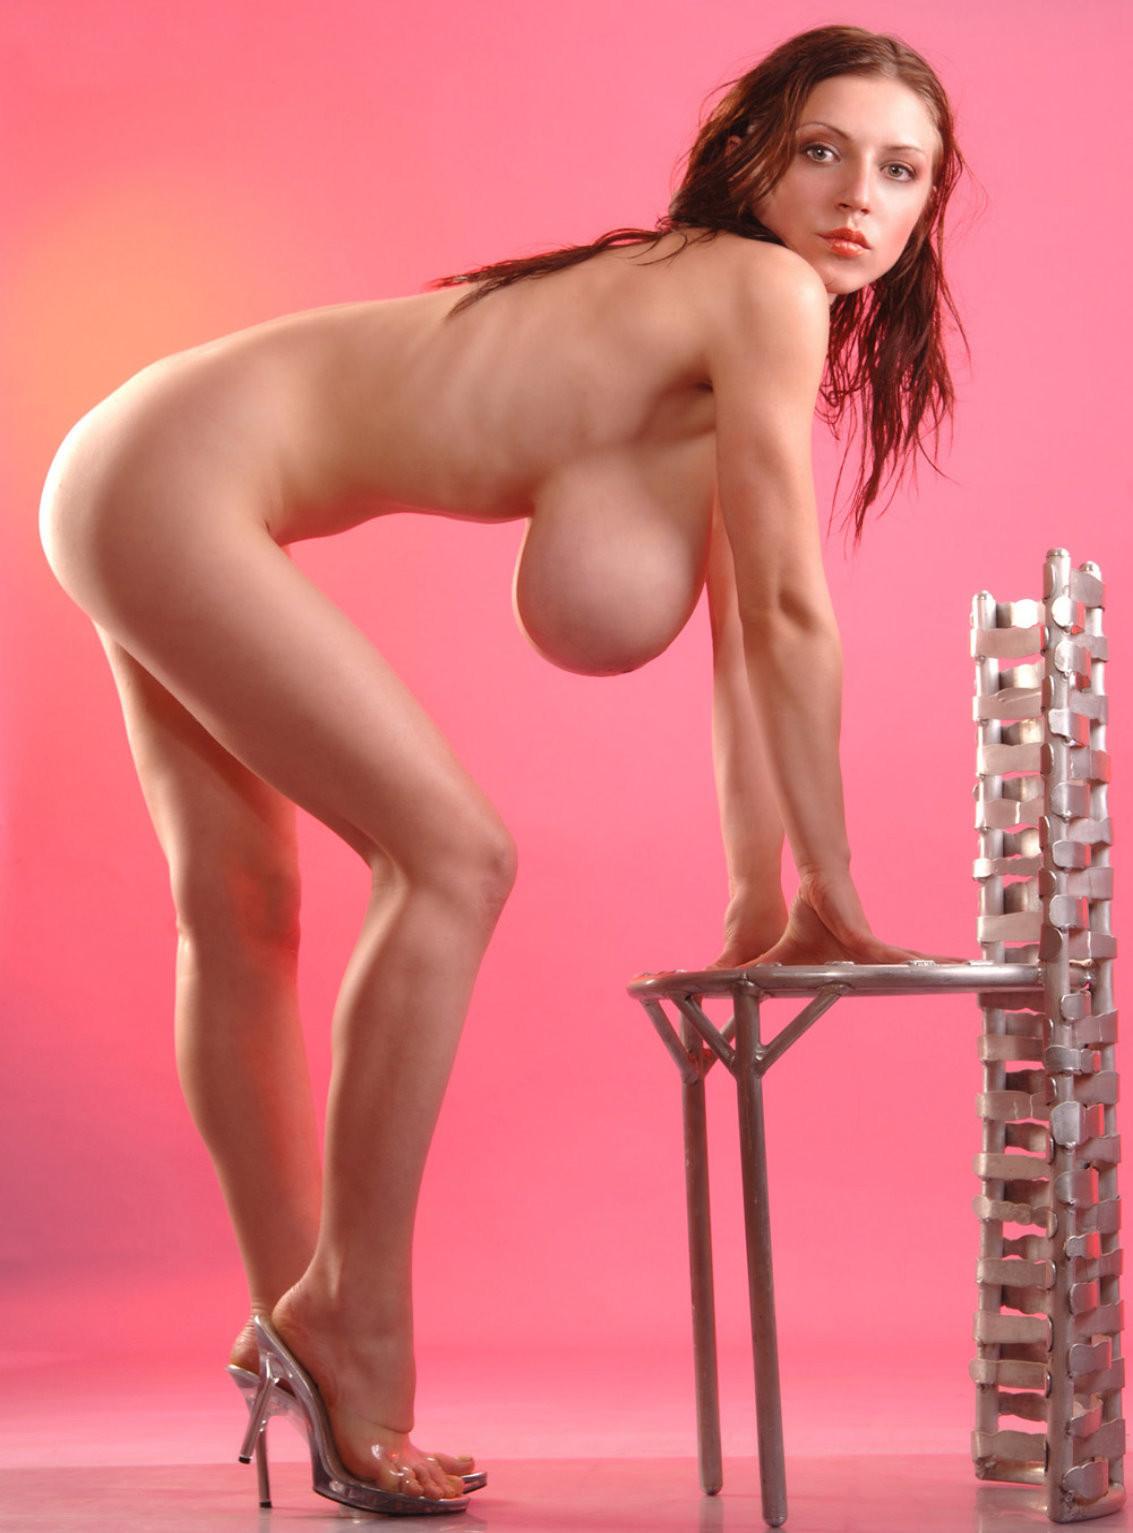 Marisa vazquez plays with a toy tmb